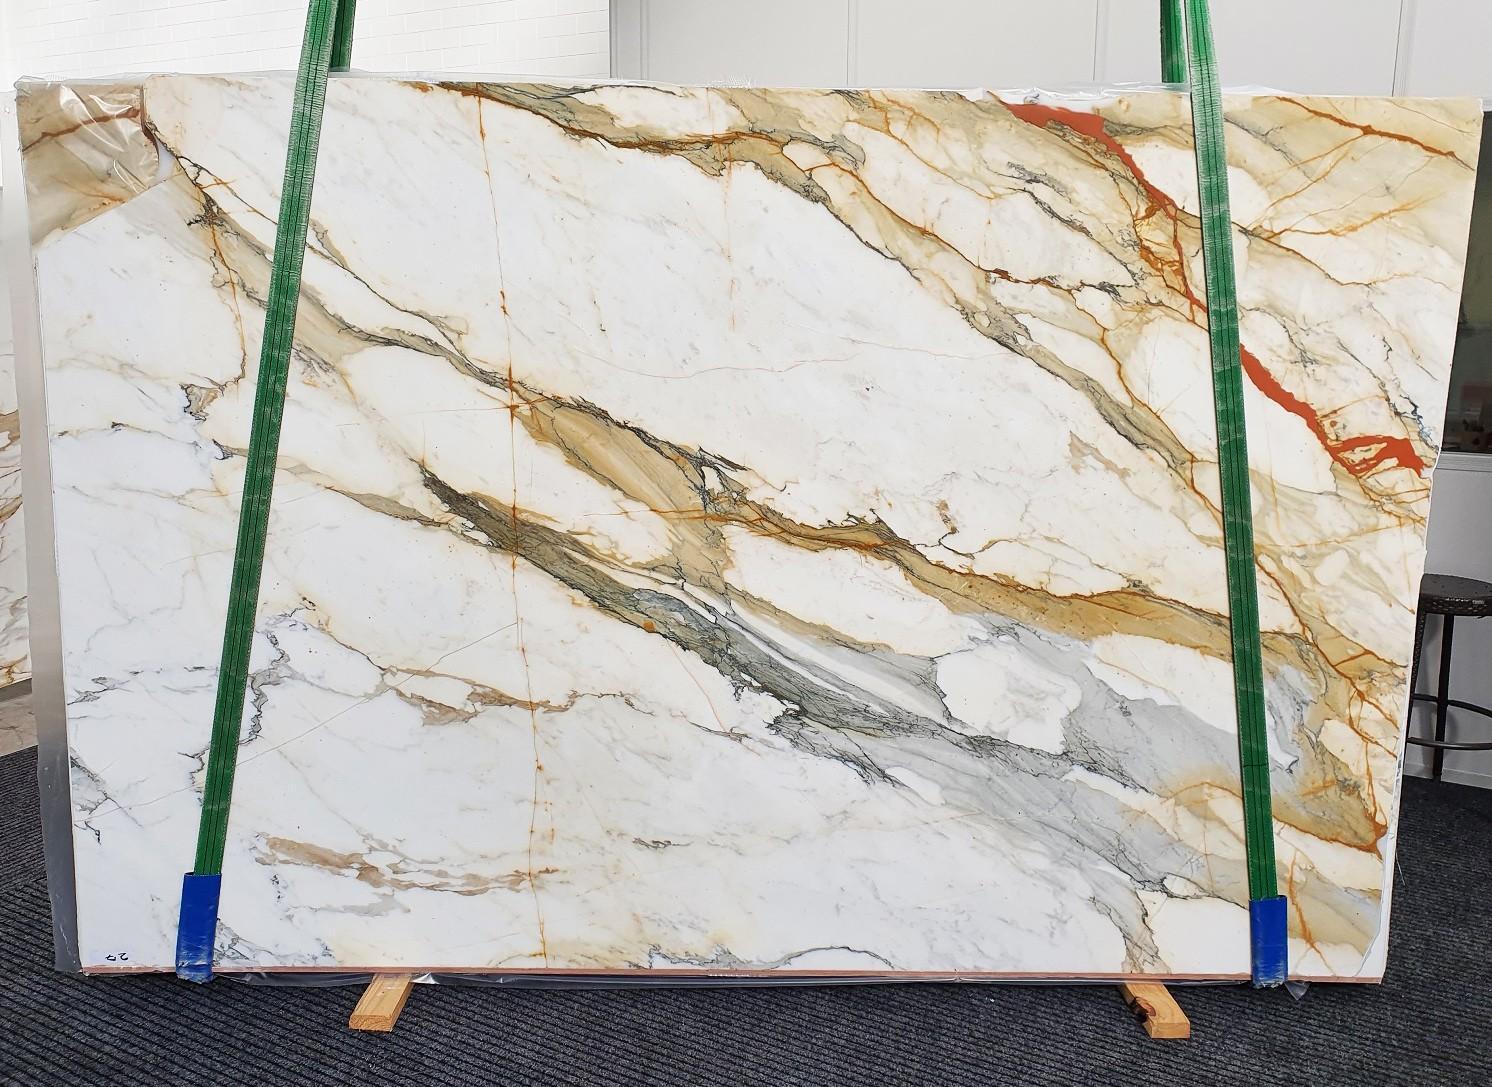 CALACATTA MACCHIAVECCHIA Supply Veneto (Italy) polished slabs 1422 , Slab #27 natural marble